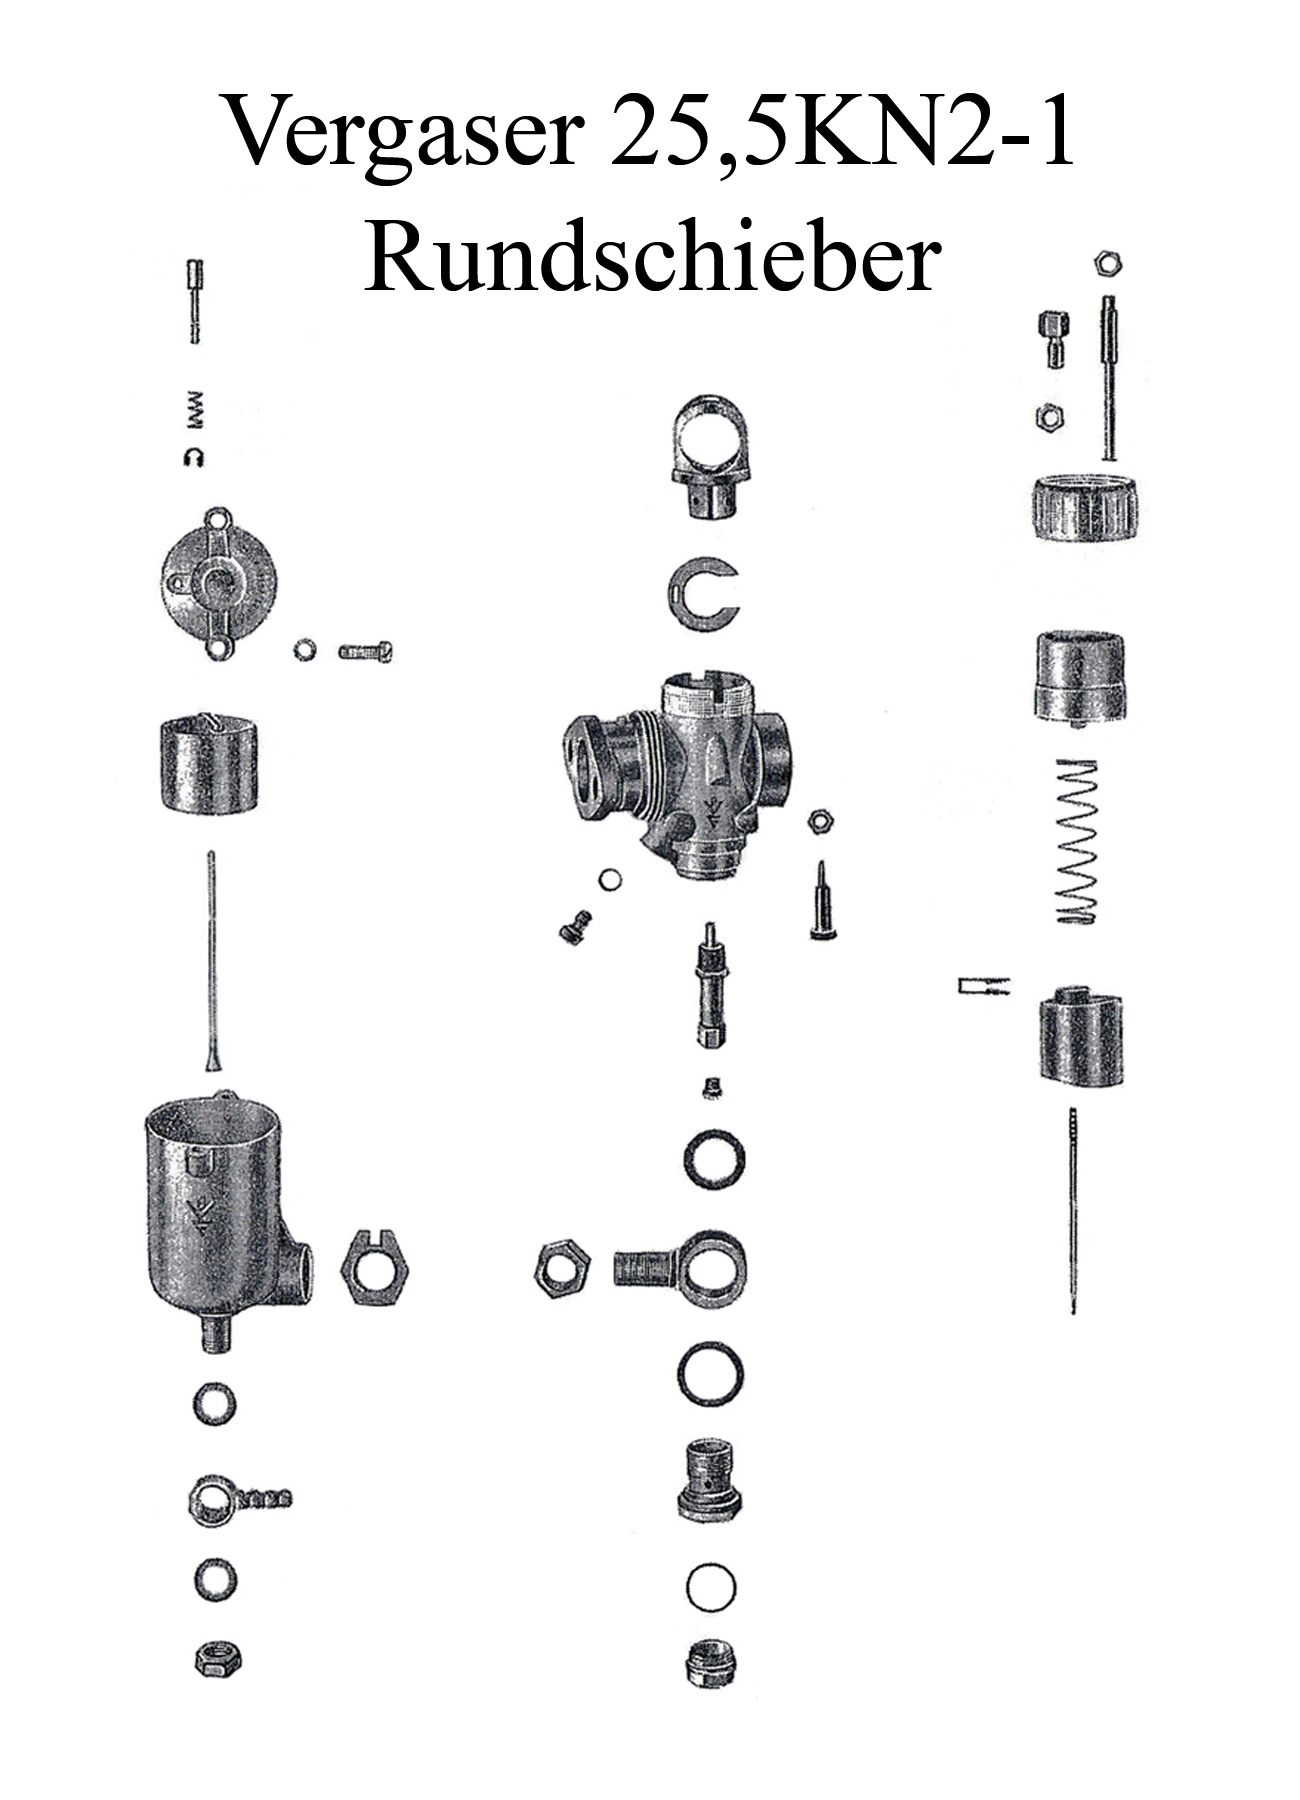 DDR-Motorrad AWO Sport BVF Rundschiebervergaser 25,5KN2-1 Düse Dichtung Schwimmer Nadelhalter Schieber Reparaturset